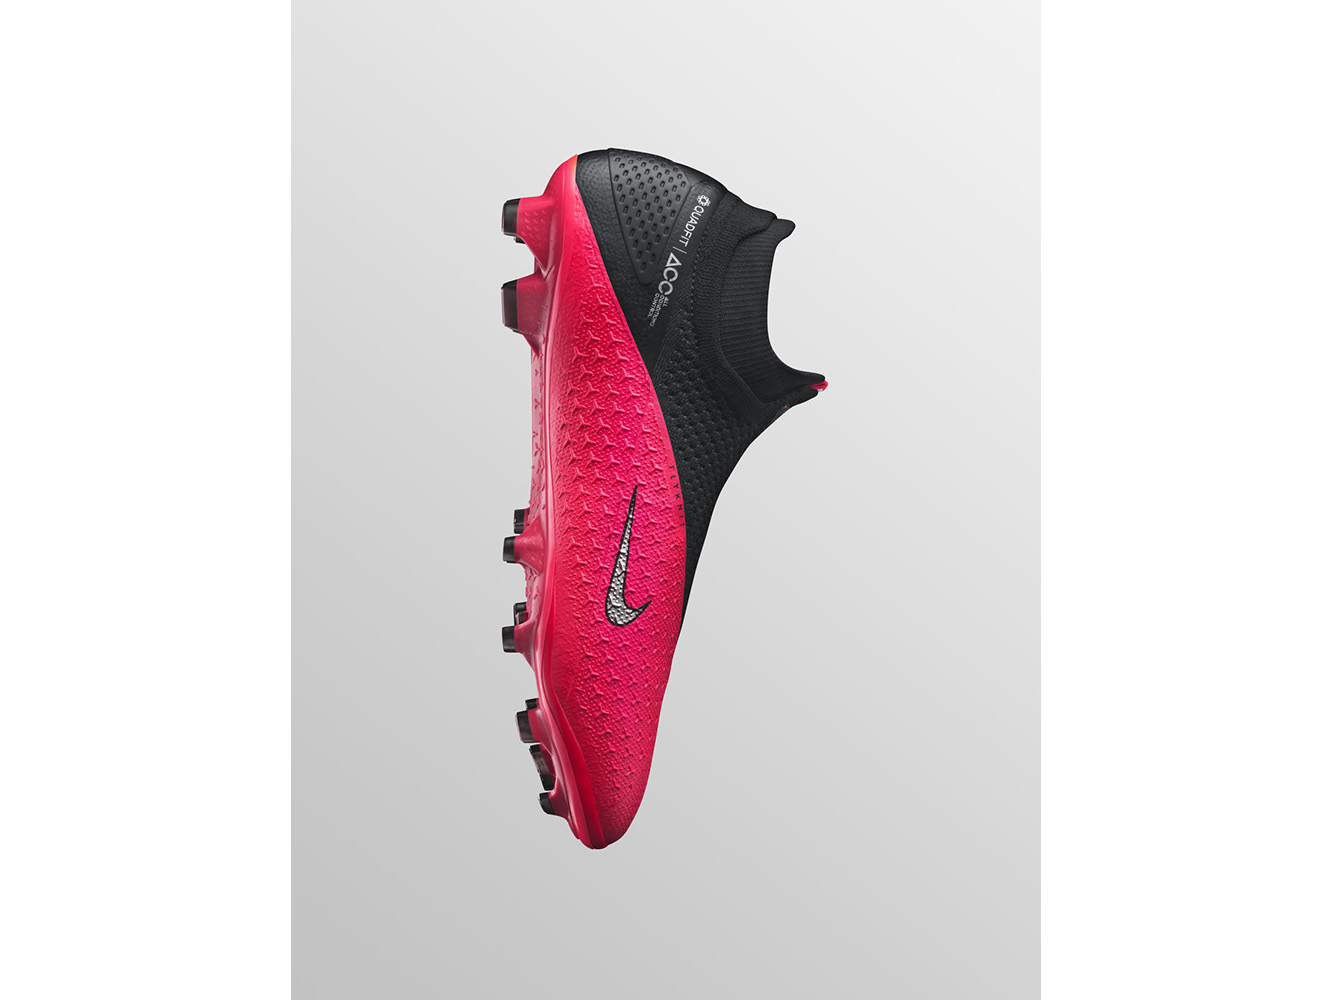 Nike_Football_PhantomVSN2_EliteFG_2_93357